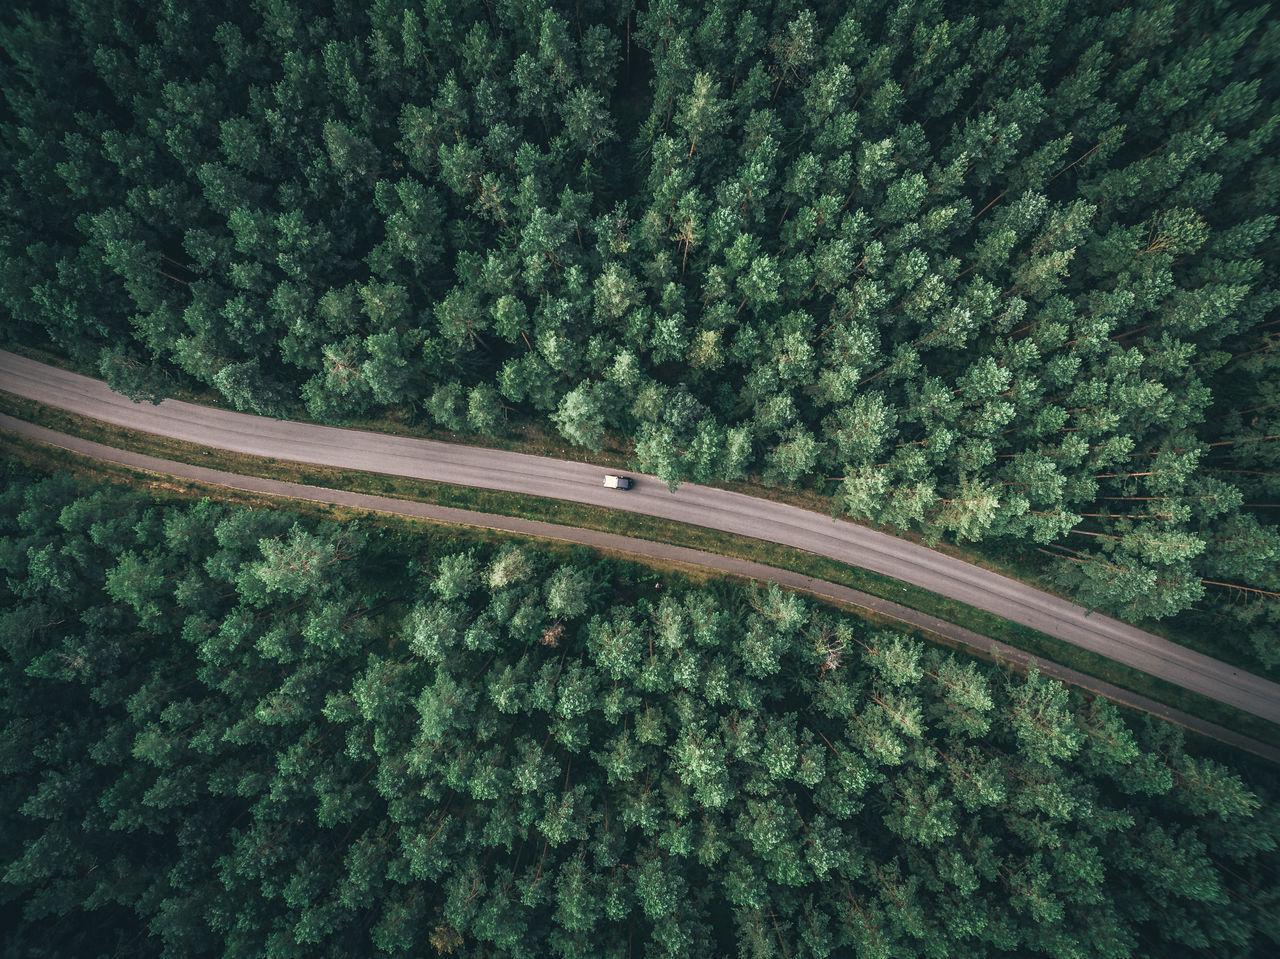 transportation, plant, mode of transportation, tree, rail transportation